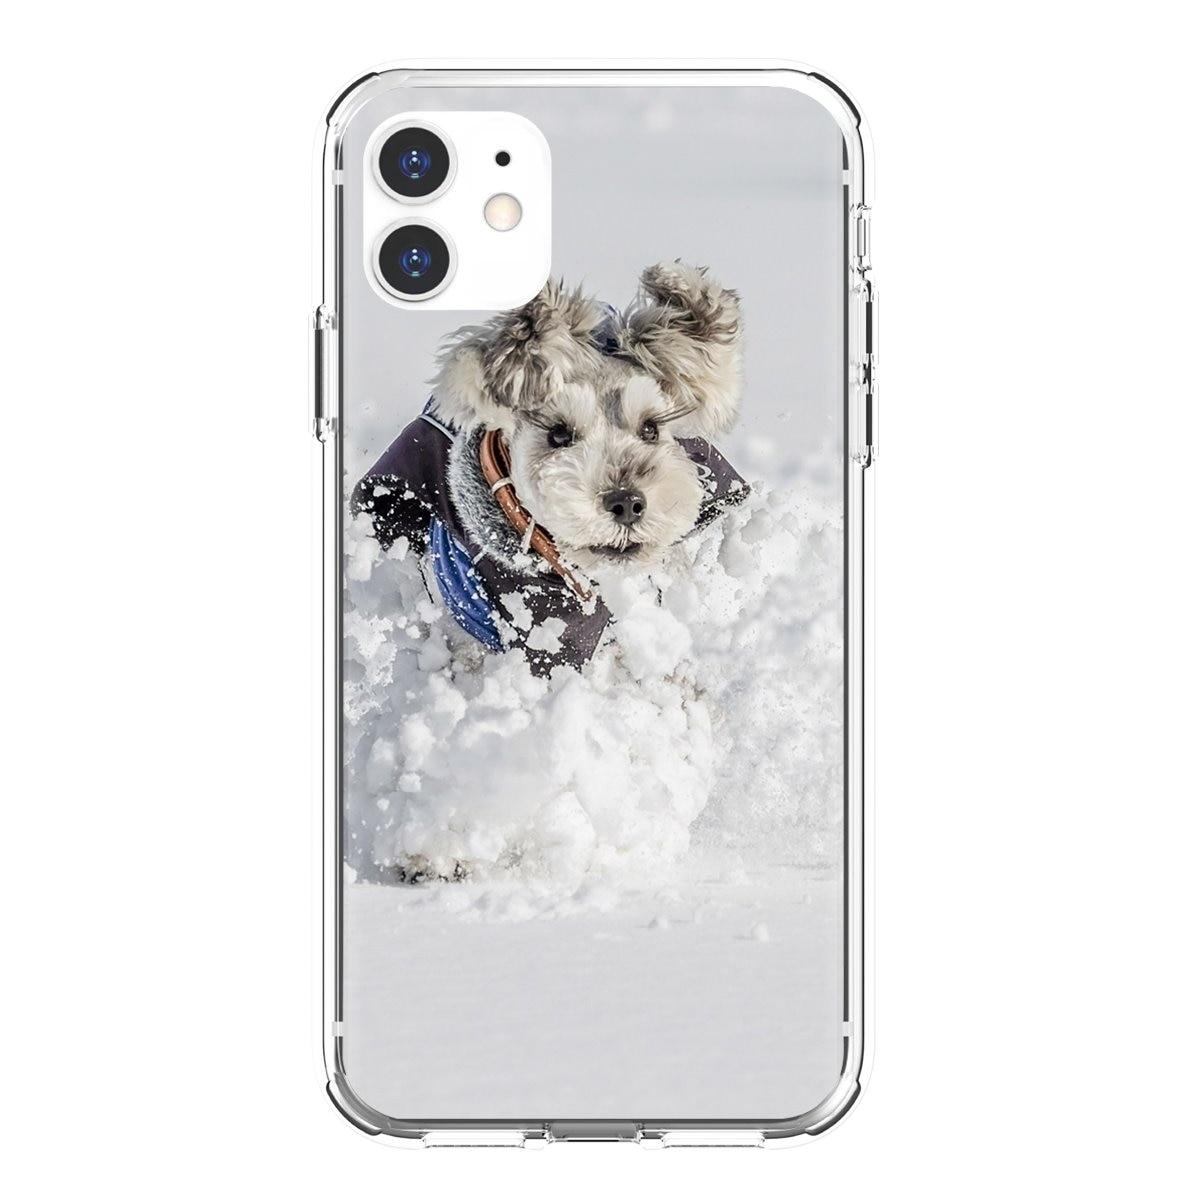 Divertido Schnauzer perro teléfono inteligente, de silicona teléfono caso para Xiaomi Mi5 Mi5S Mi6 Mi3 Mi4 Mi4i Mi4C Redmi nota 2 3 3S 5 5A 6 6A Pro